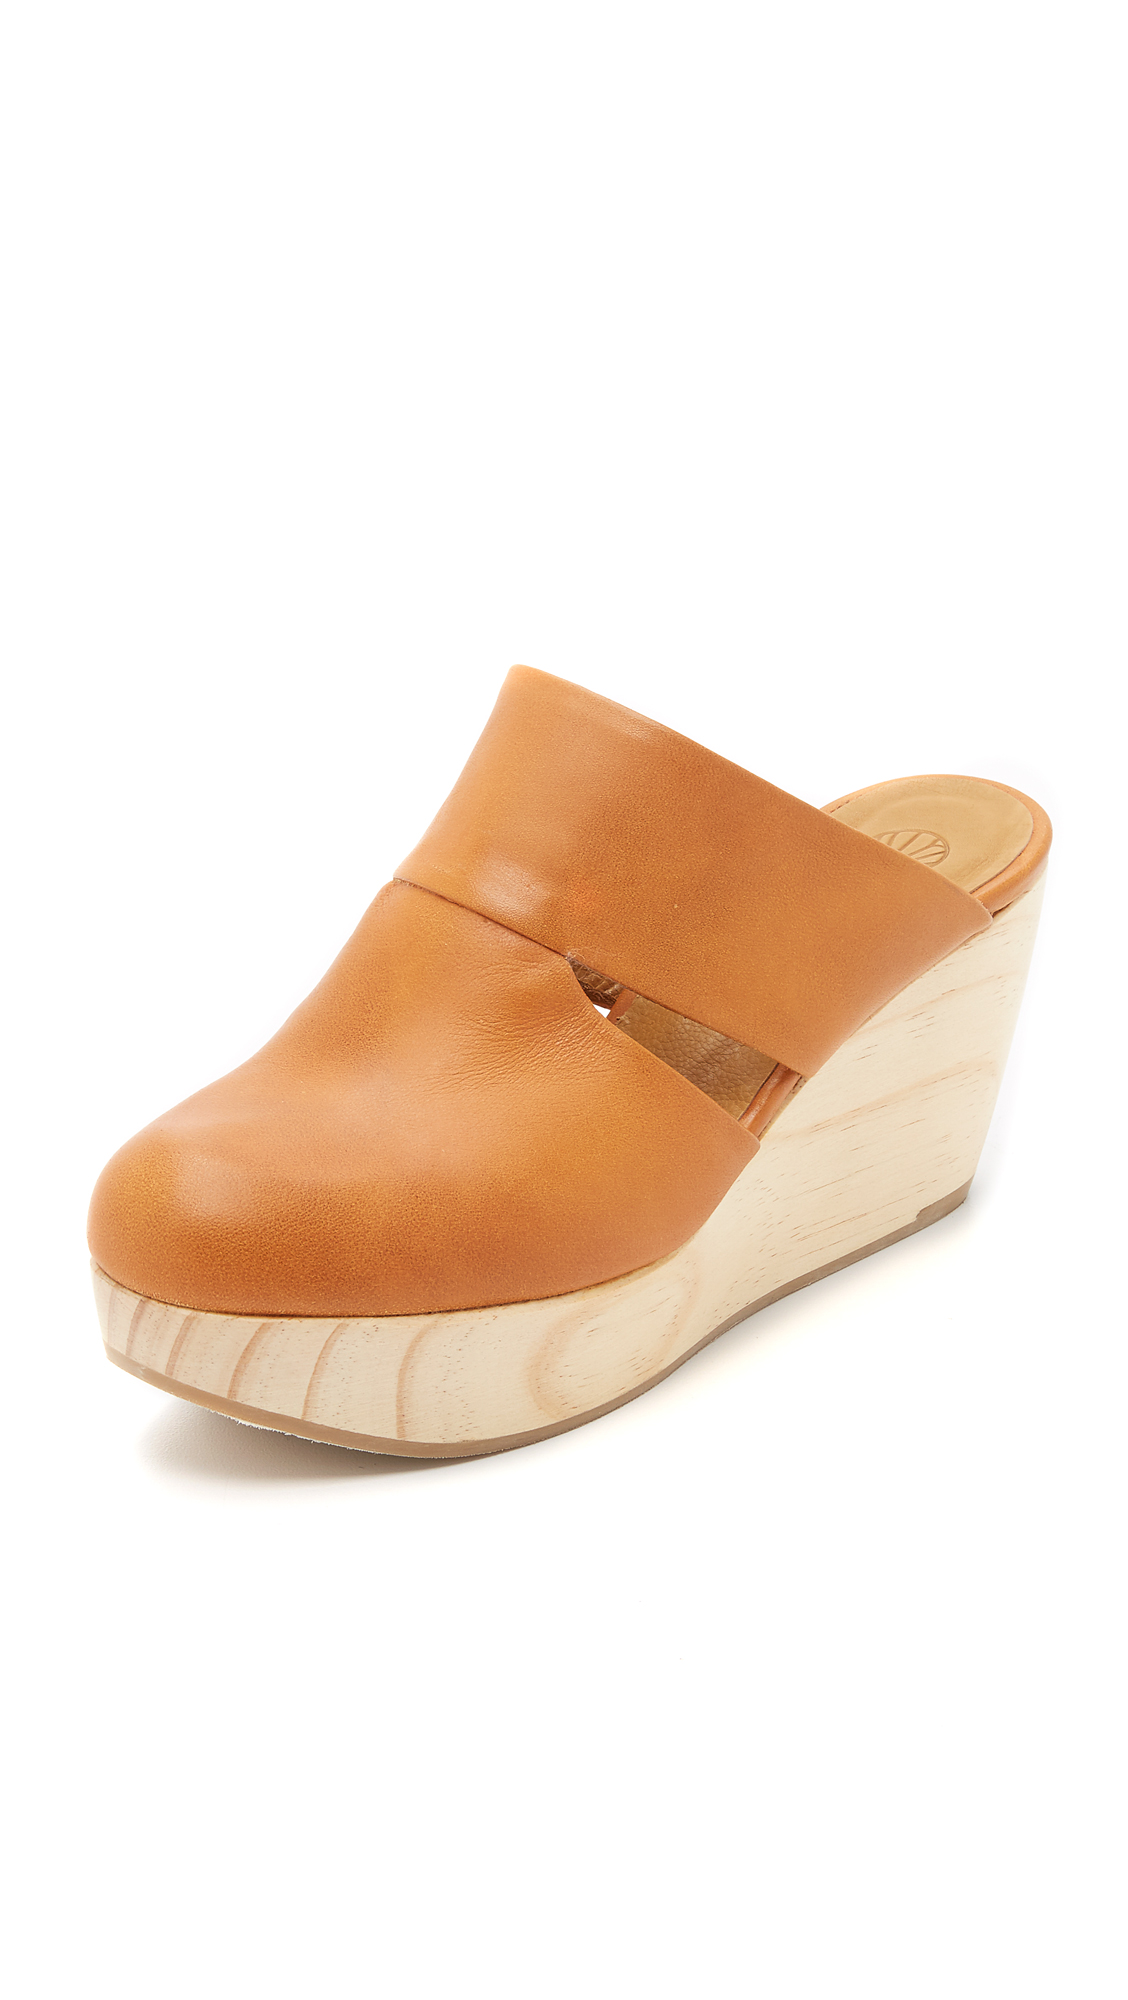 41bac25eaef7e5 Coclico Shoes Hazel Clogs